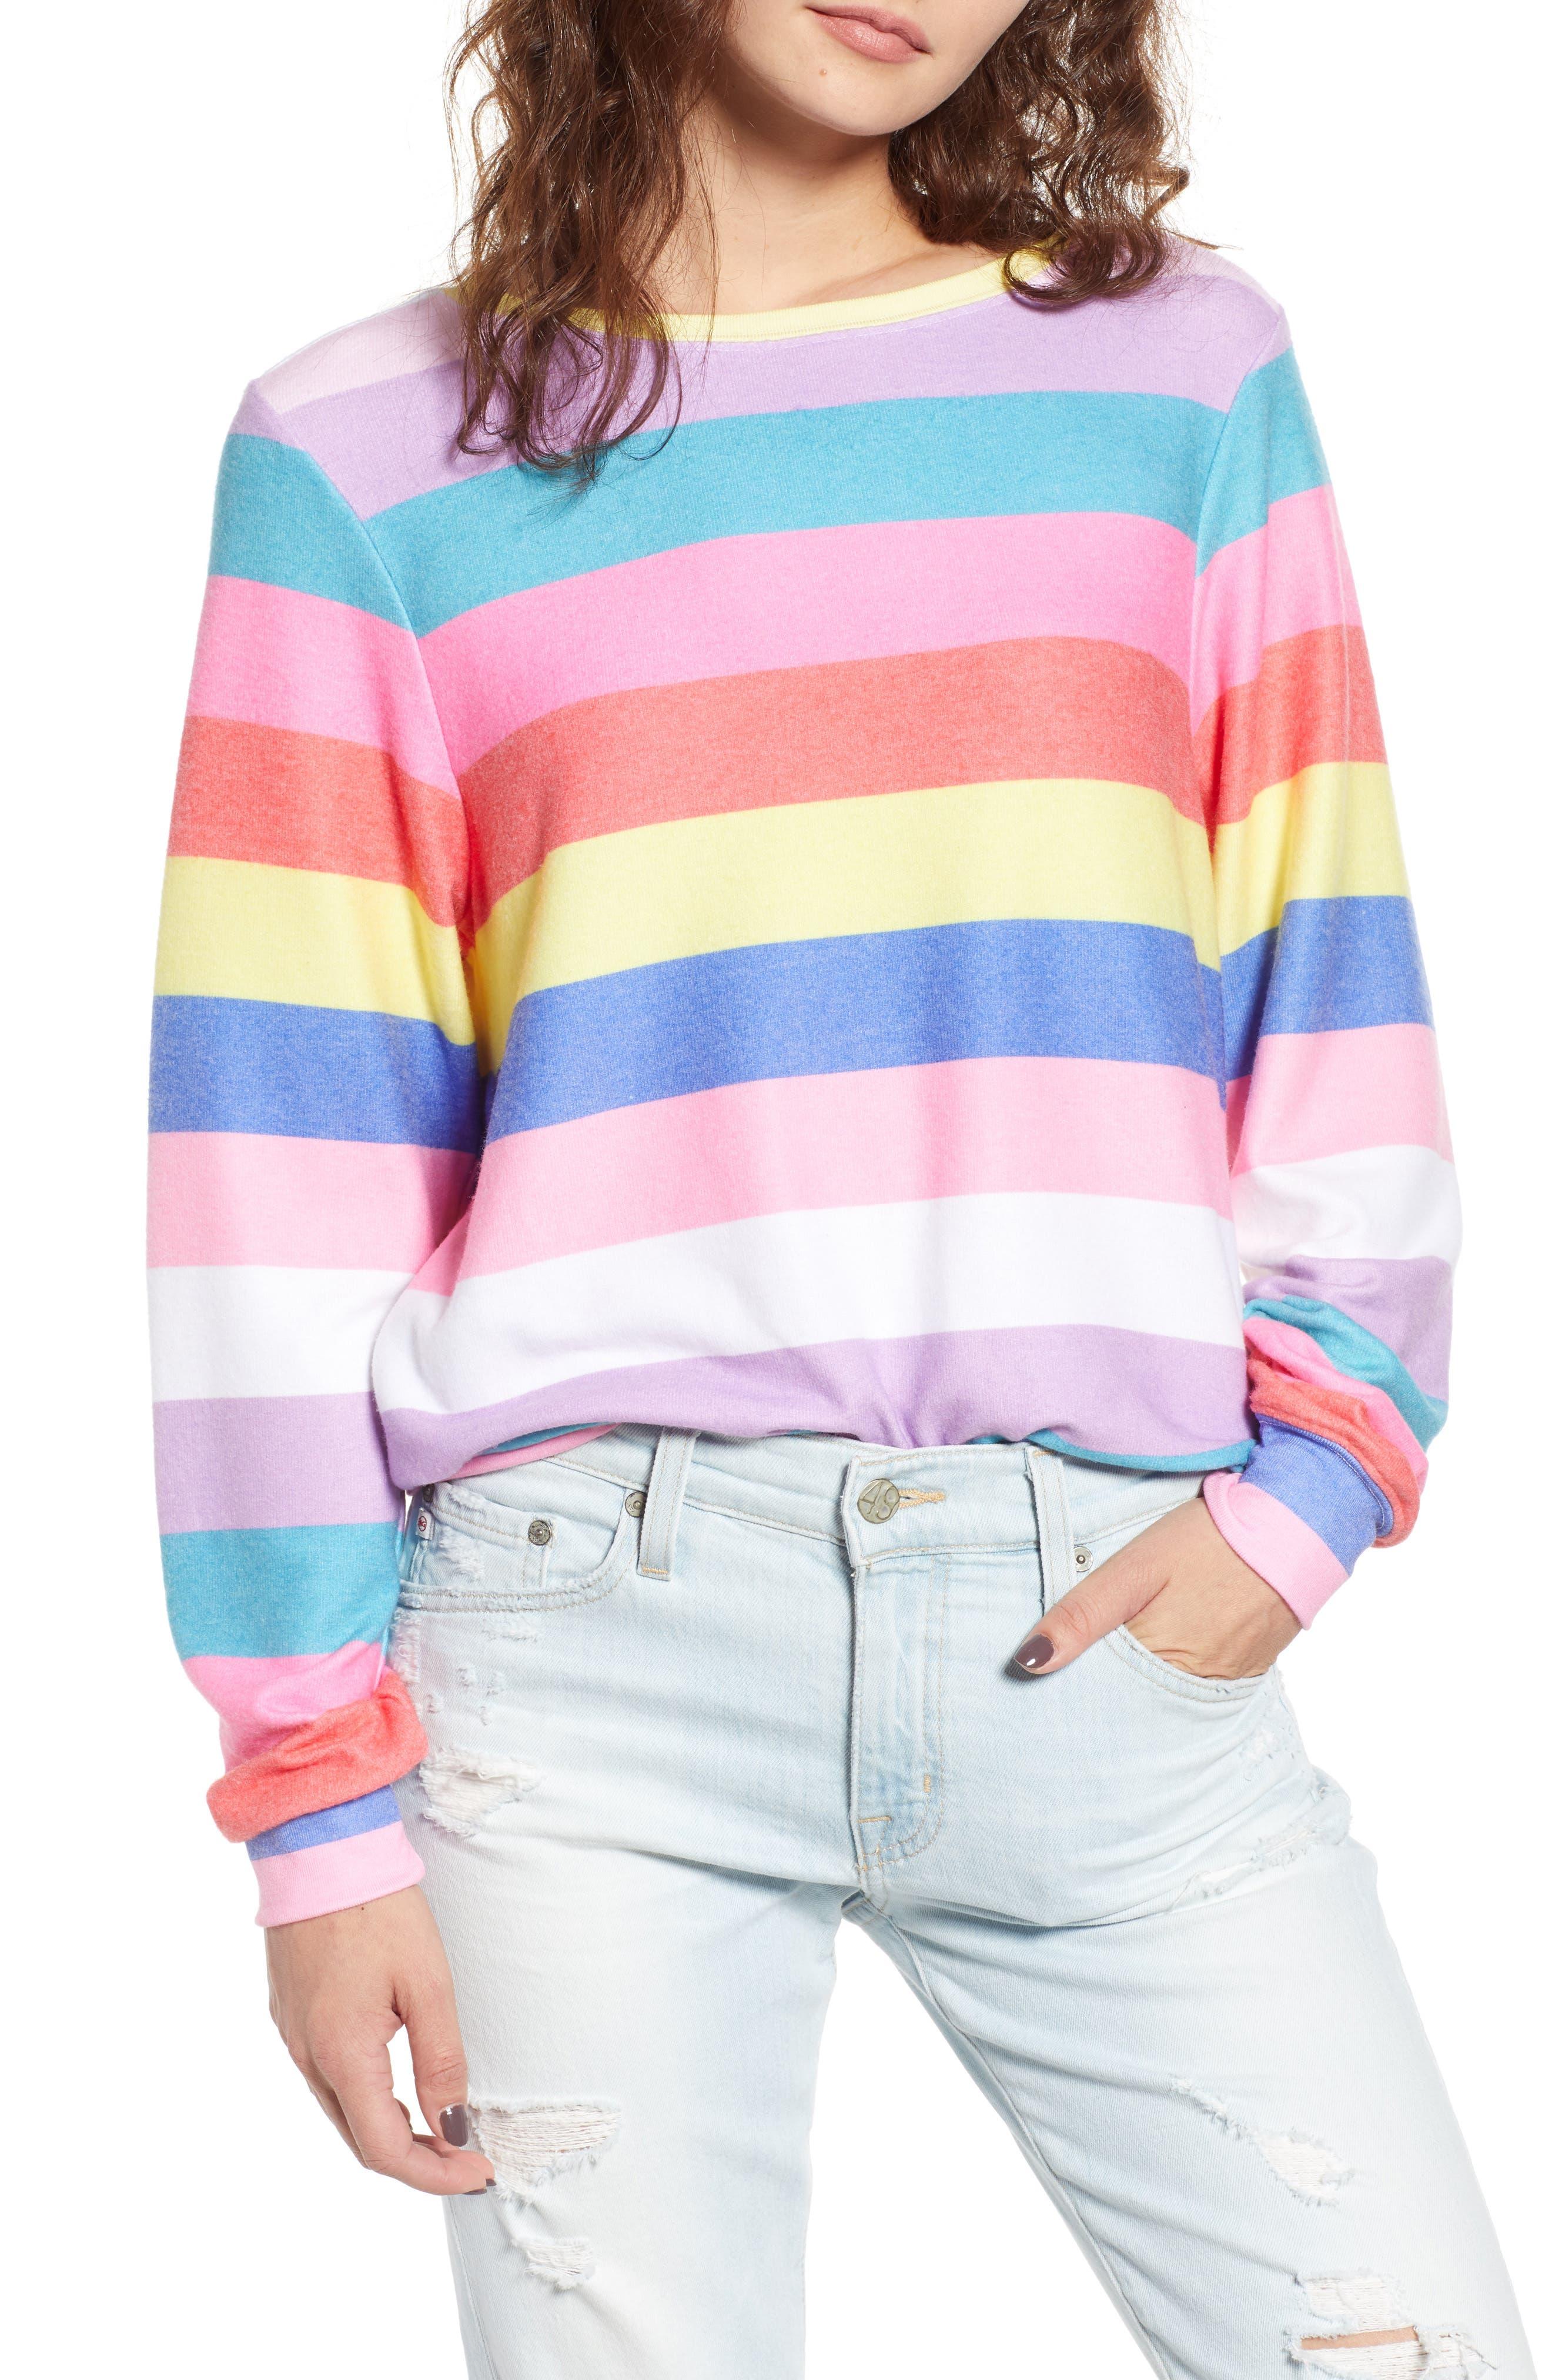 Castaway Roadtrip Sweatshirt,                             Main thumbnail 1, color,                             650